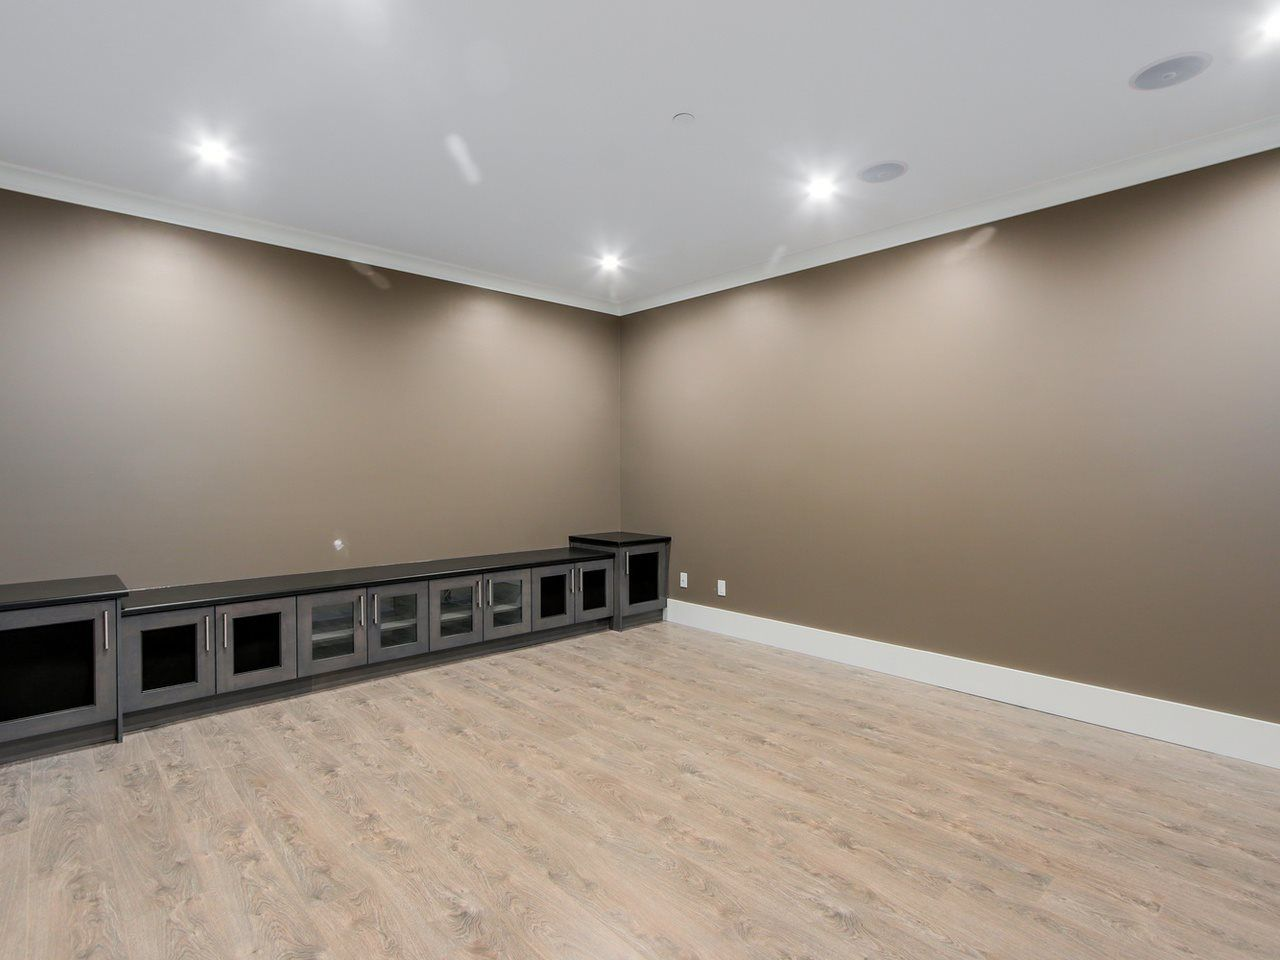 Photo 18: Photos: 1560 MAPLE Street: White Rock House for sale (South Surrey White Rock)  : MLS®# R2138926